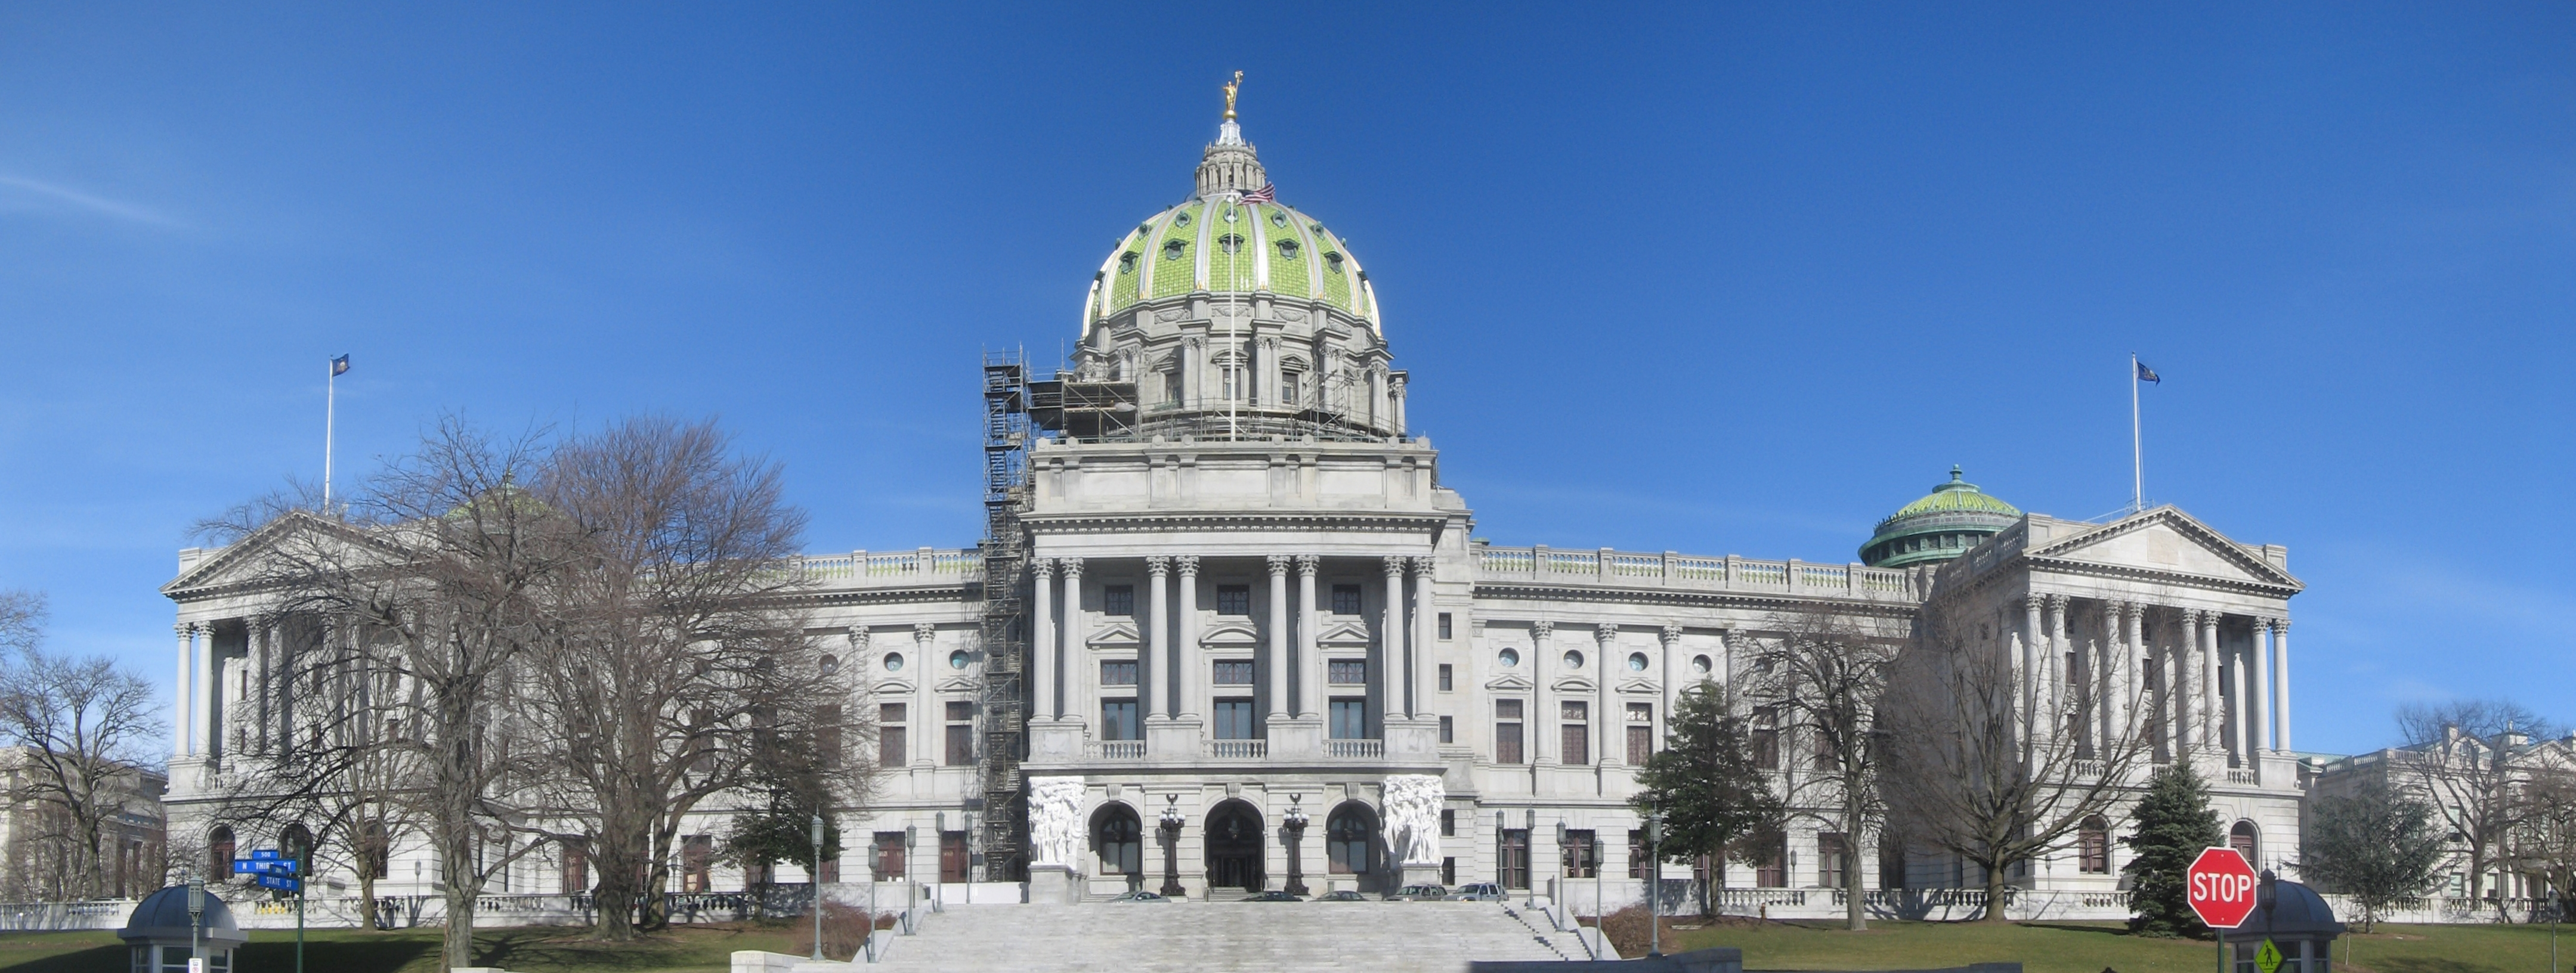 Pennsylvania_State_Capitol_Front_Panorama.jpg